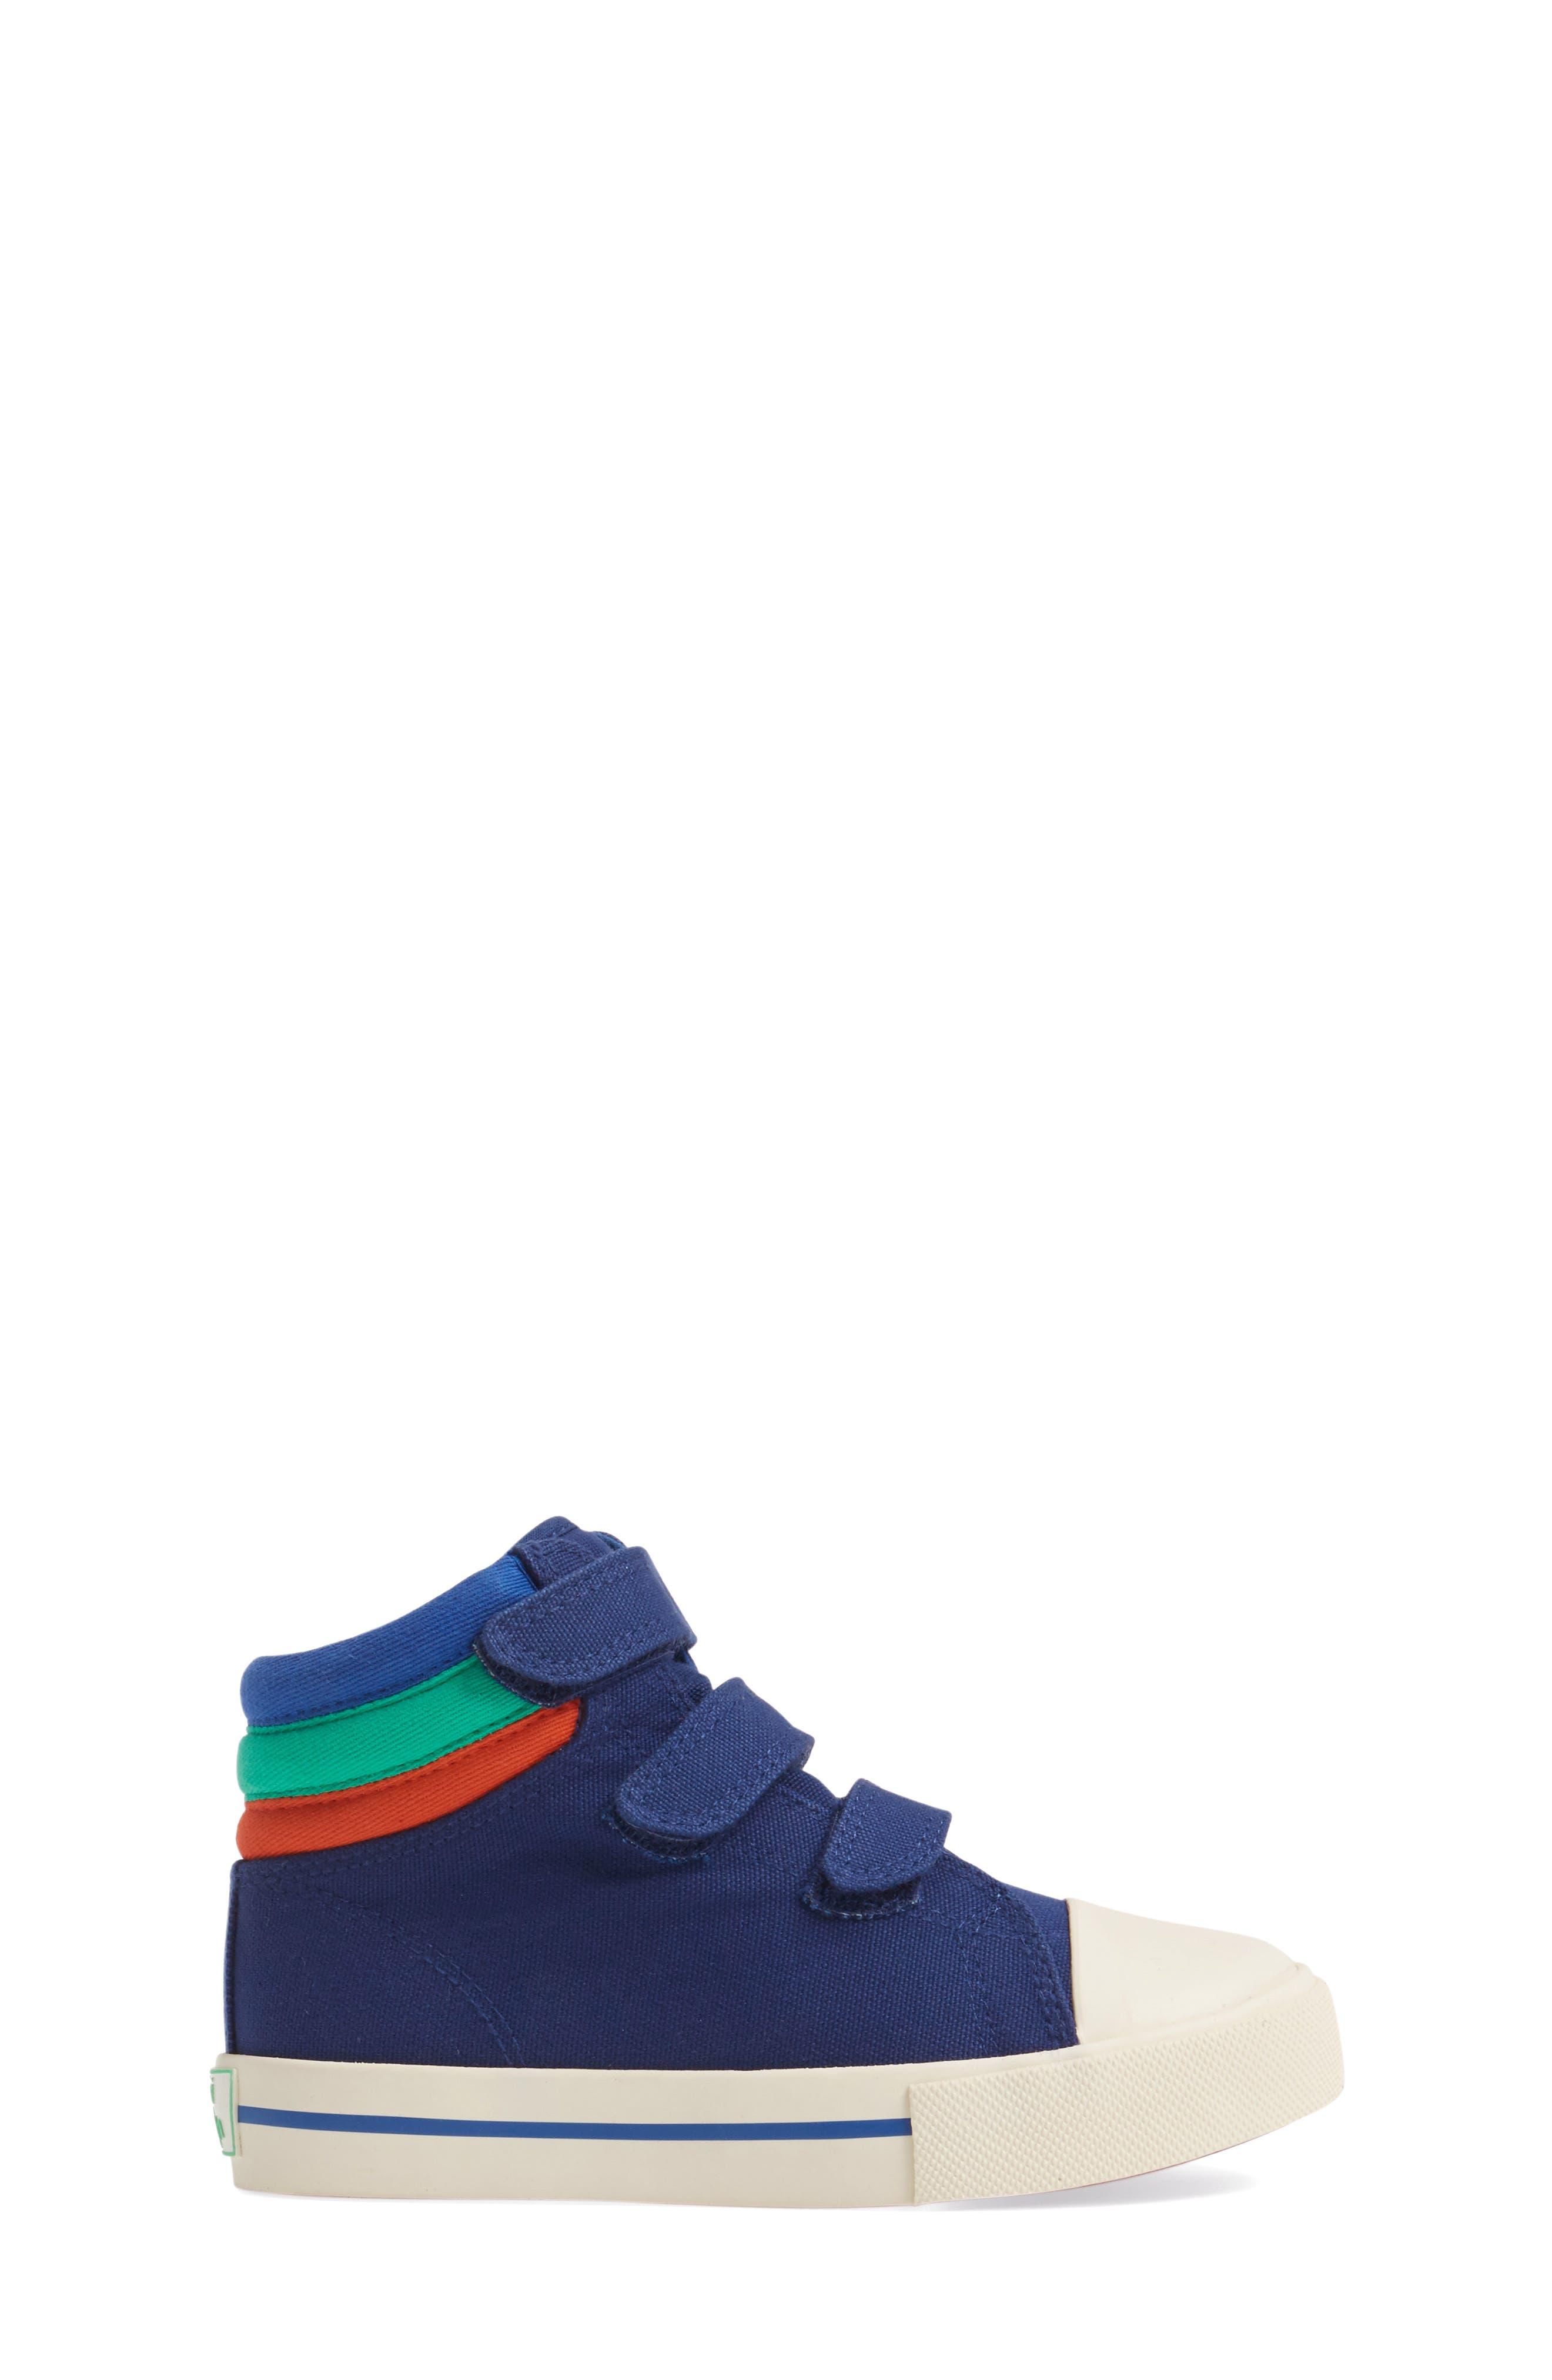 High Top Sneaker,                             Alternate thumbnail 6, color,